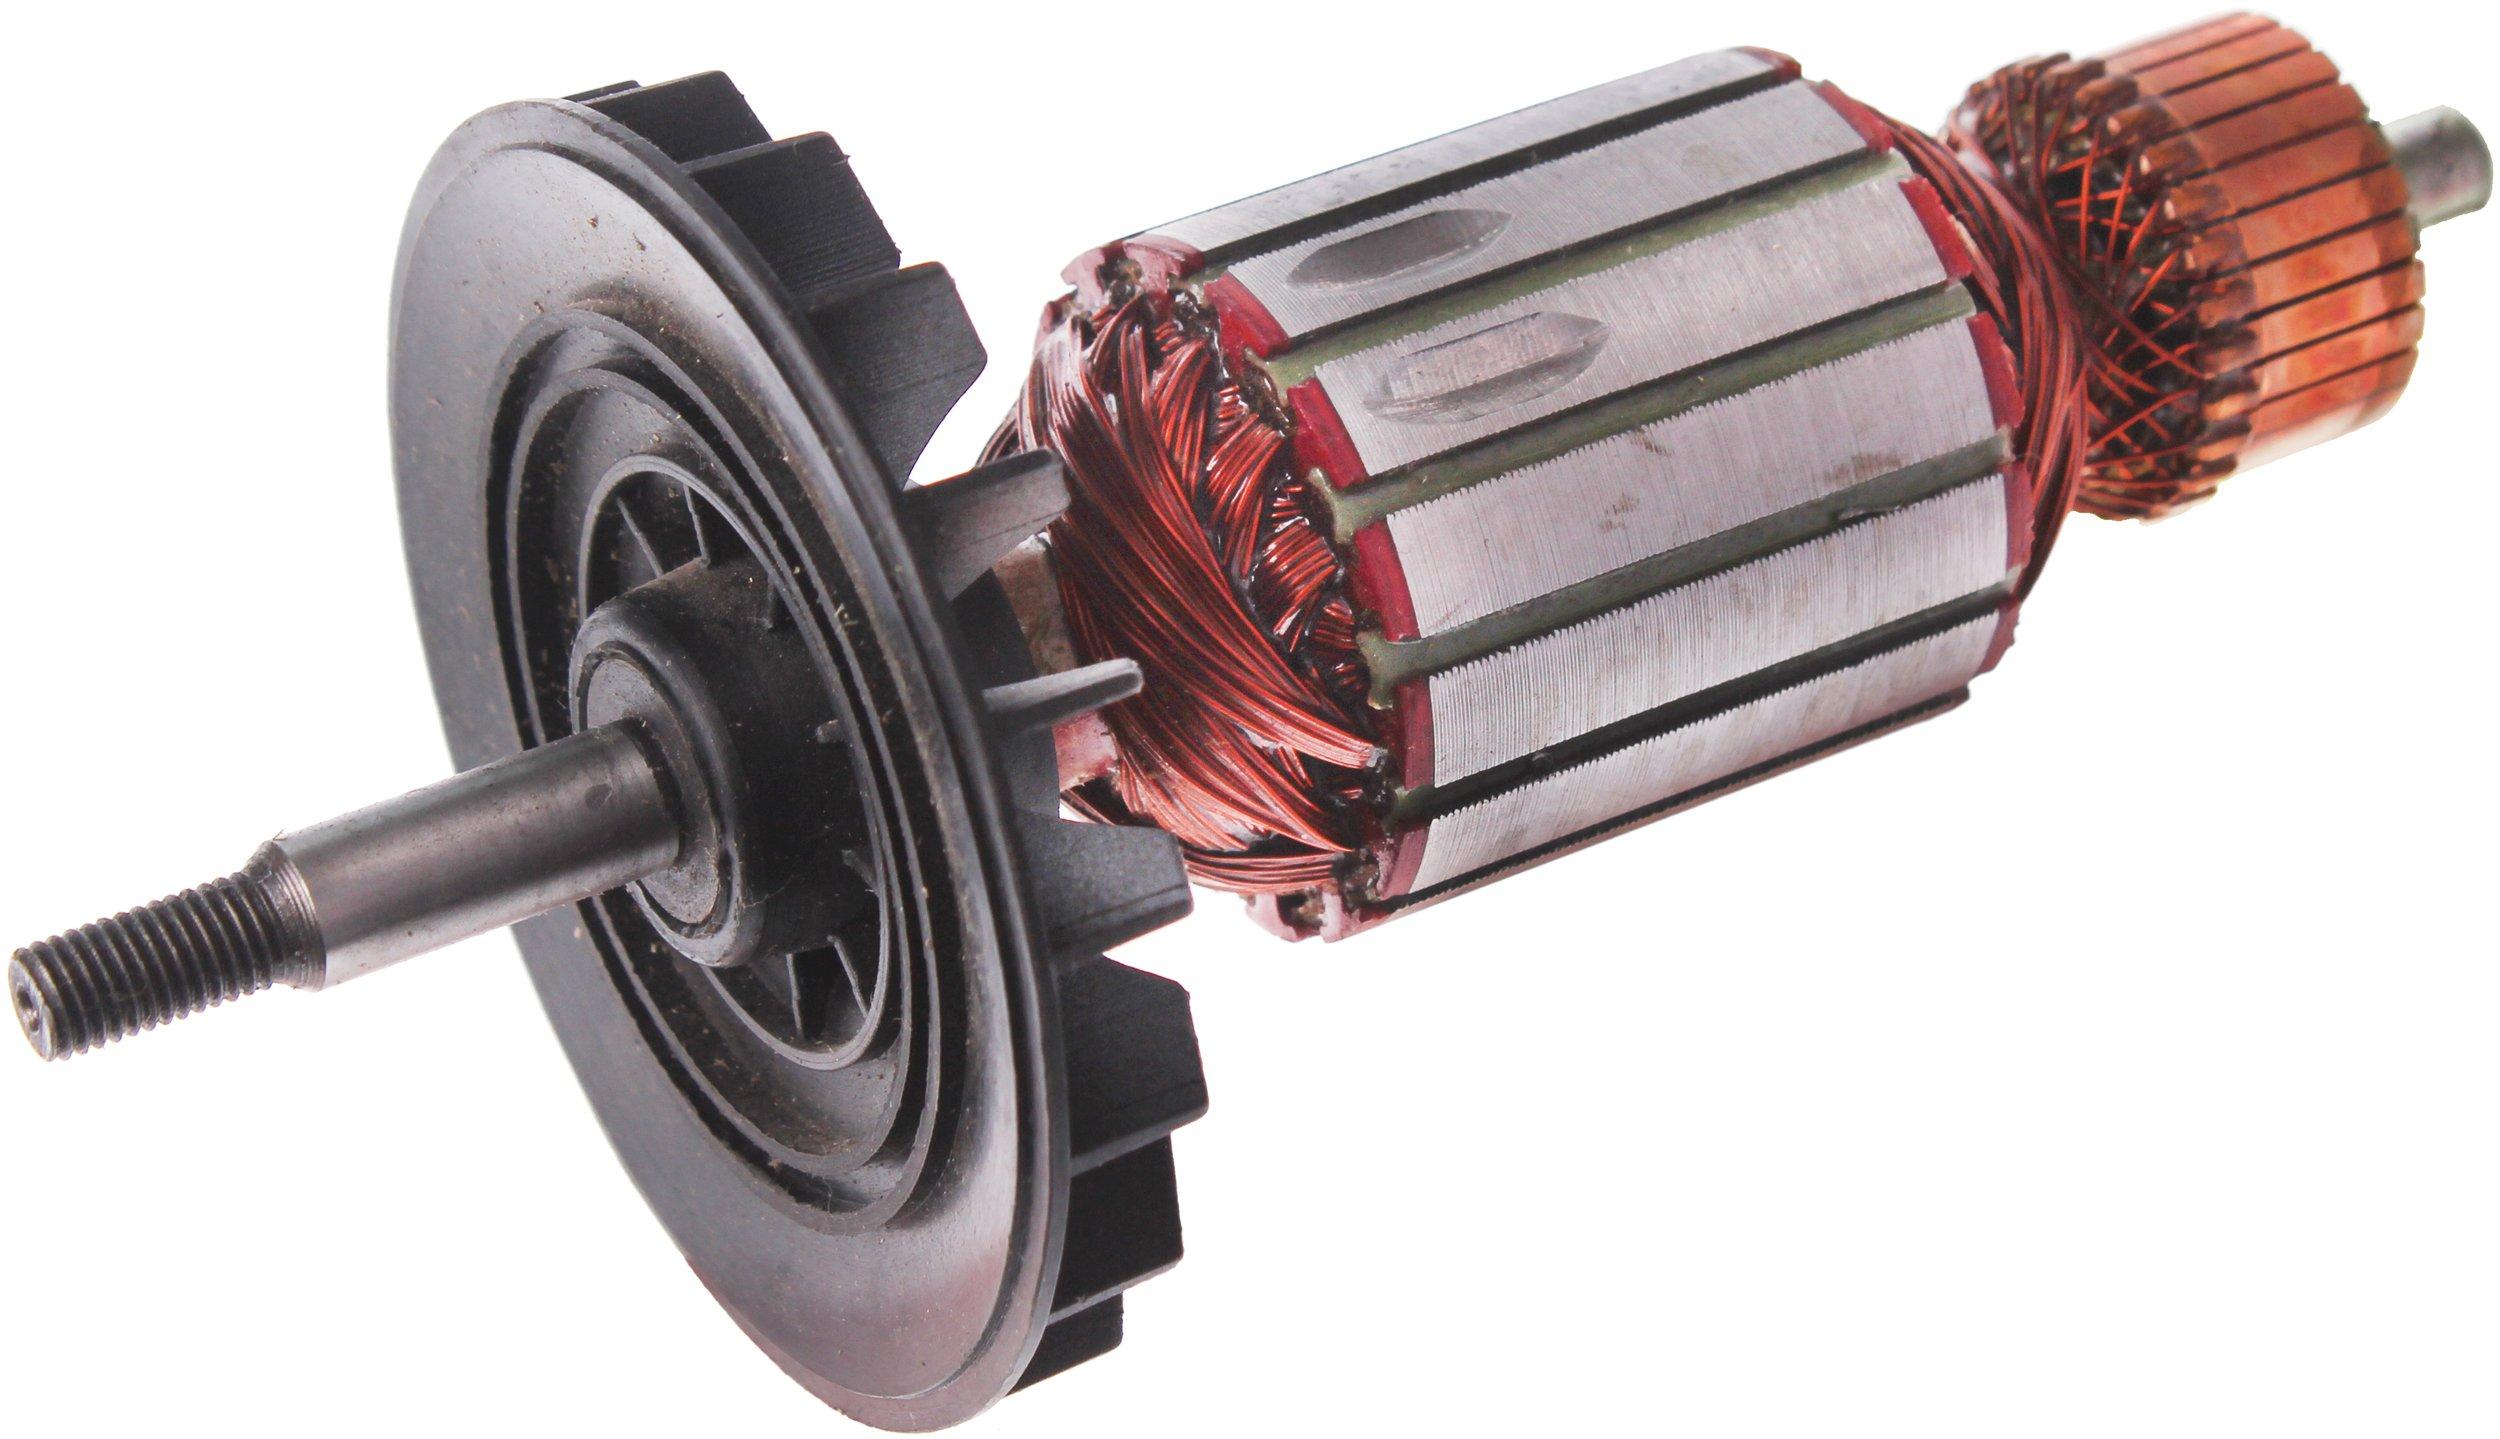 Rotor Black Decker GK 310, 368817-01